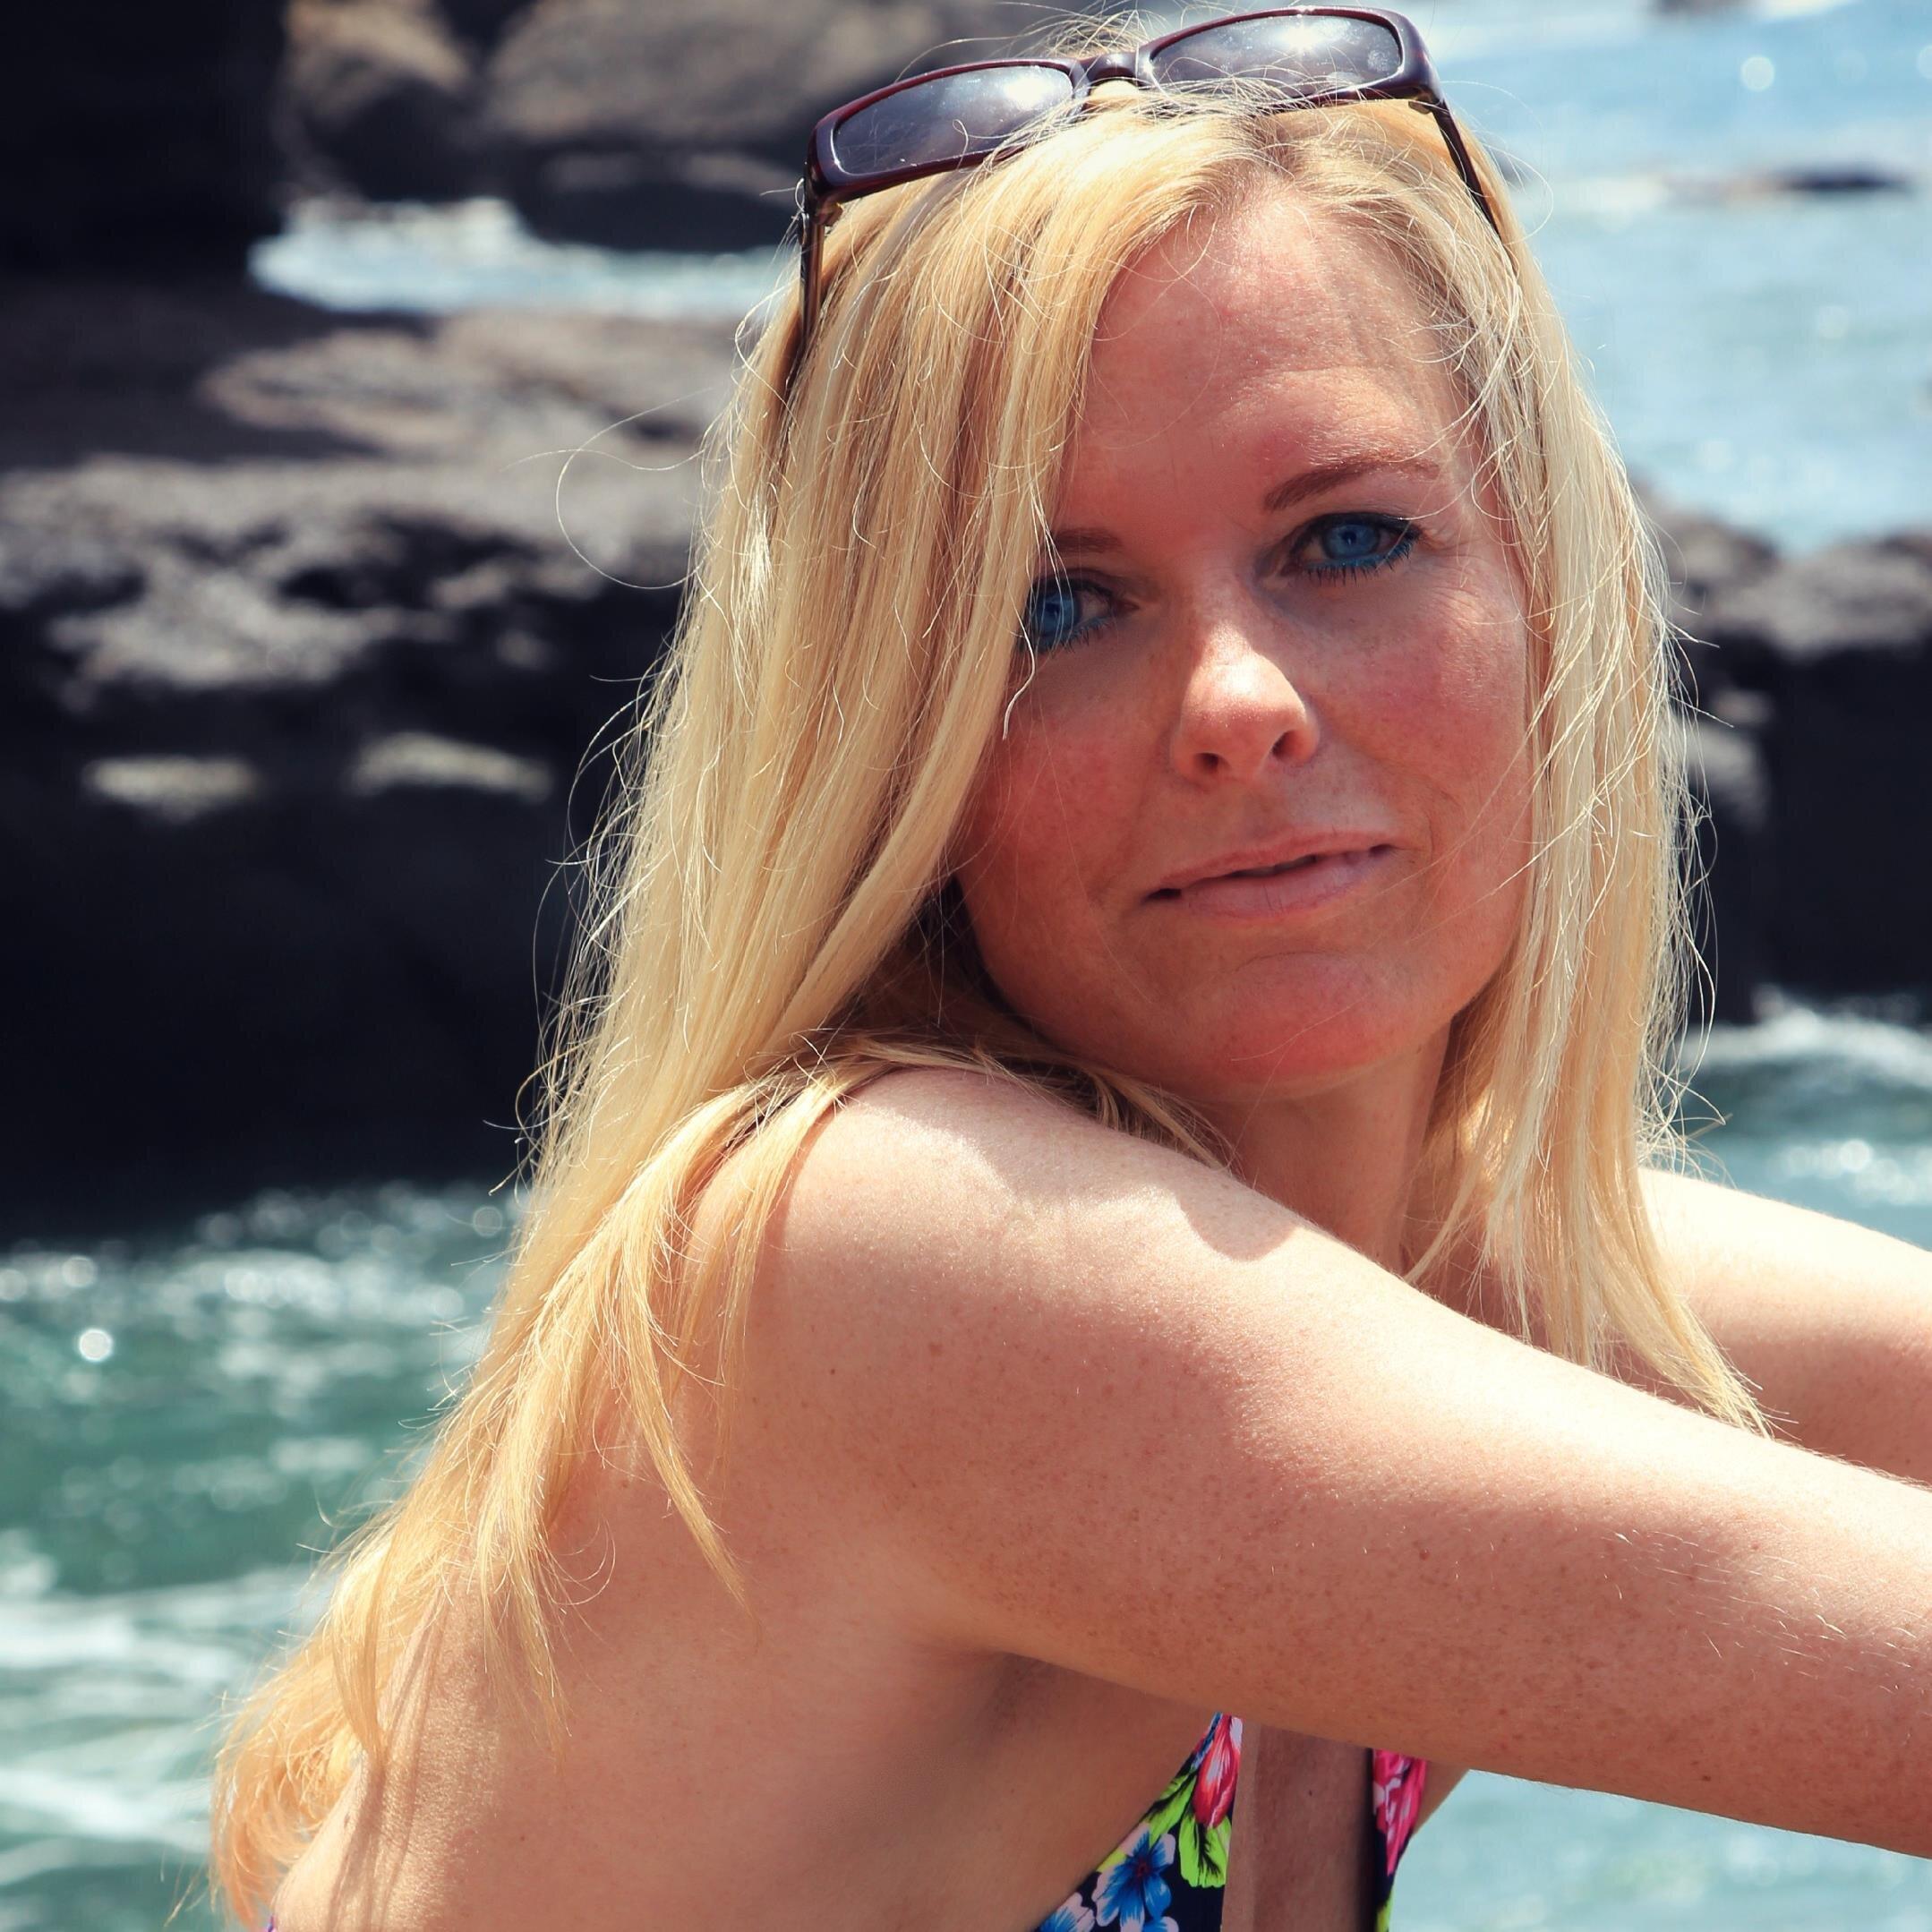 norsk dating gratis Hønefoss